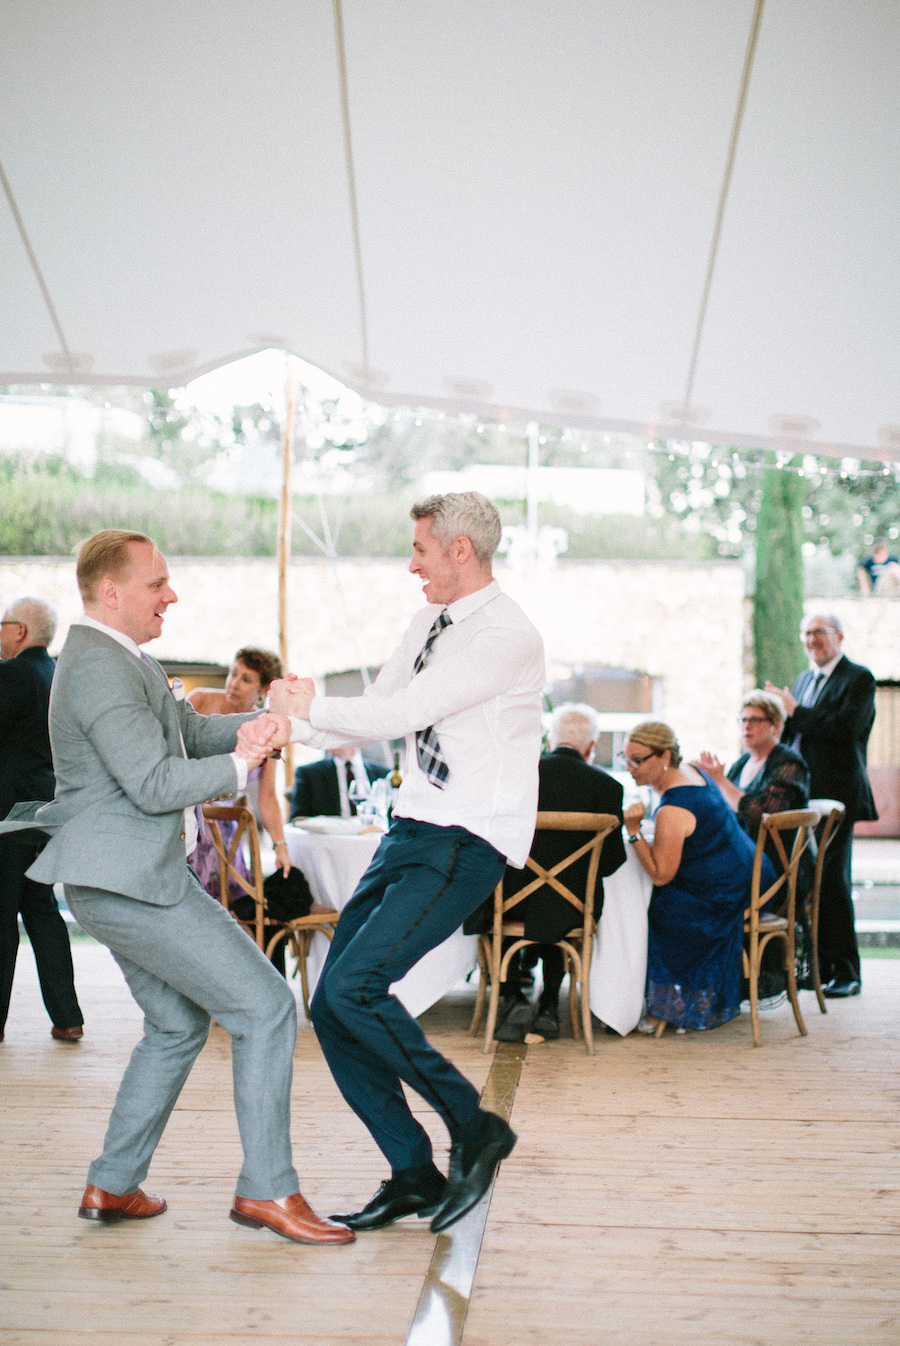 saya-photography-jewish-wedding-provence-rustic-lourmarin-le-galinier-51.jpg